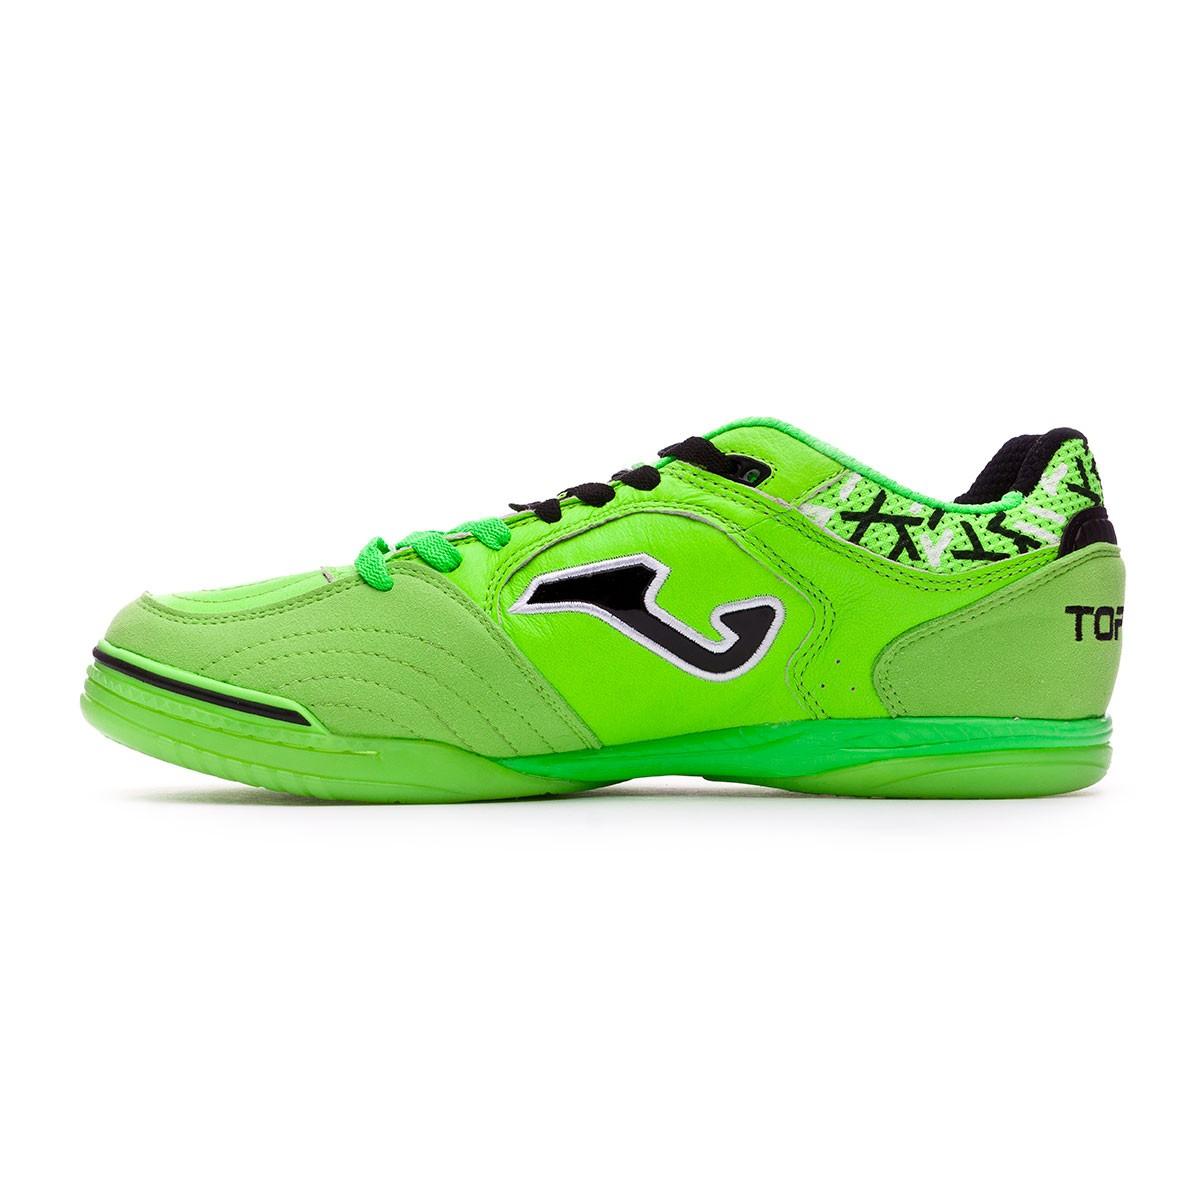 Joma Zapatilla Top Flex Verde Fluor-Naranja Talla 7,5 USA